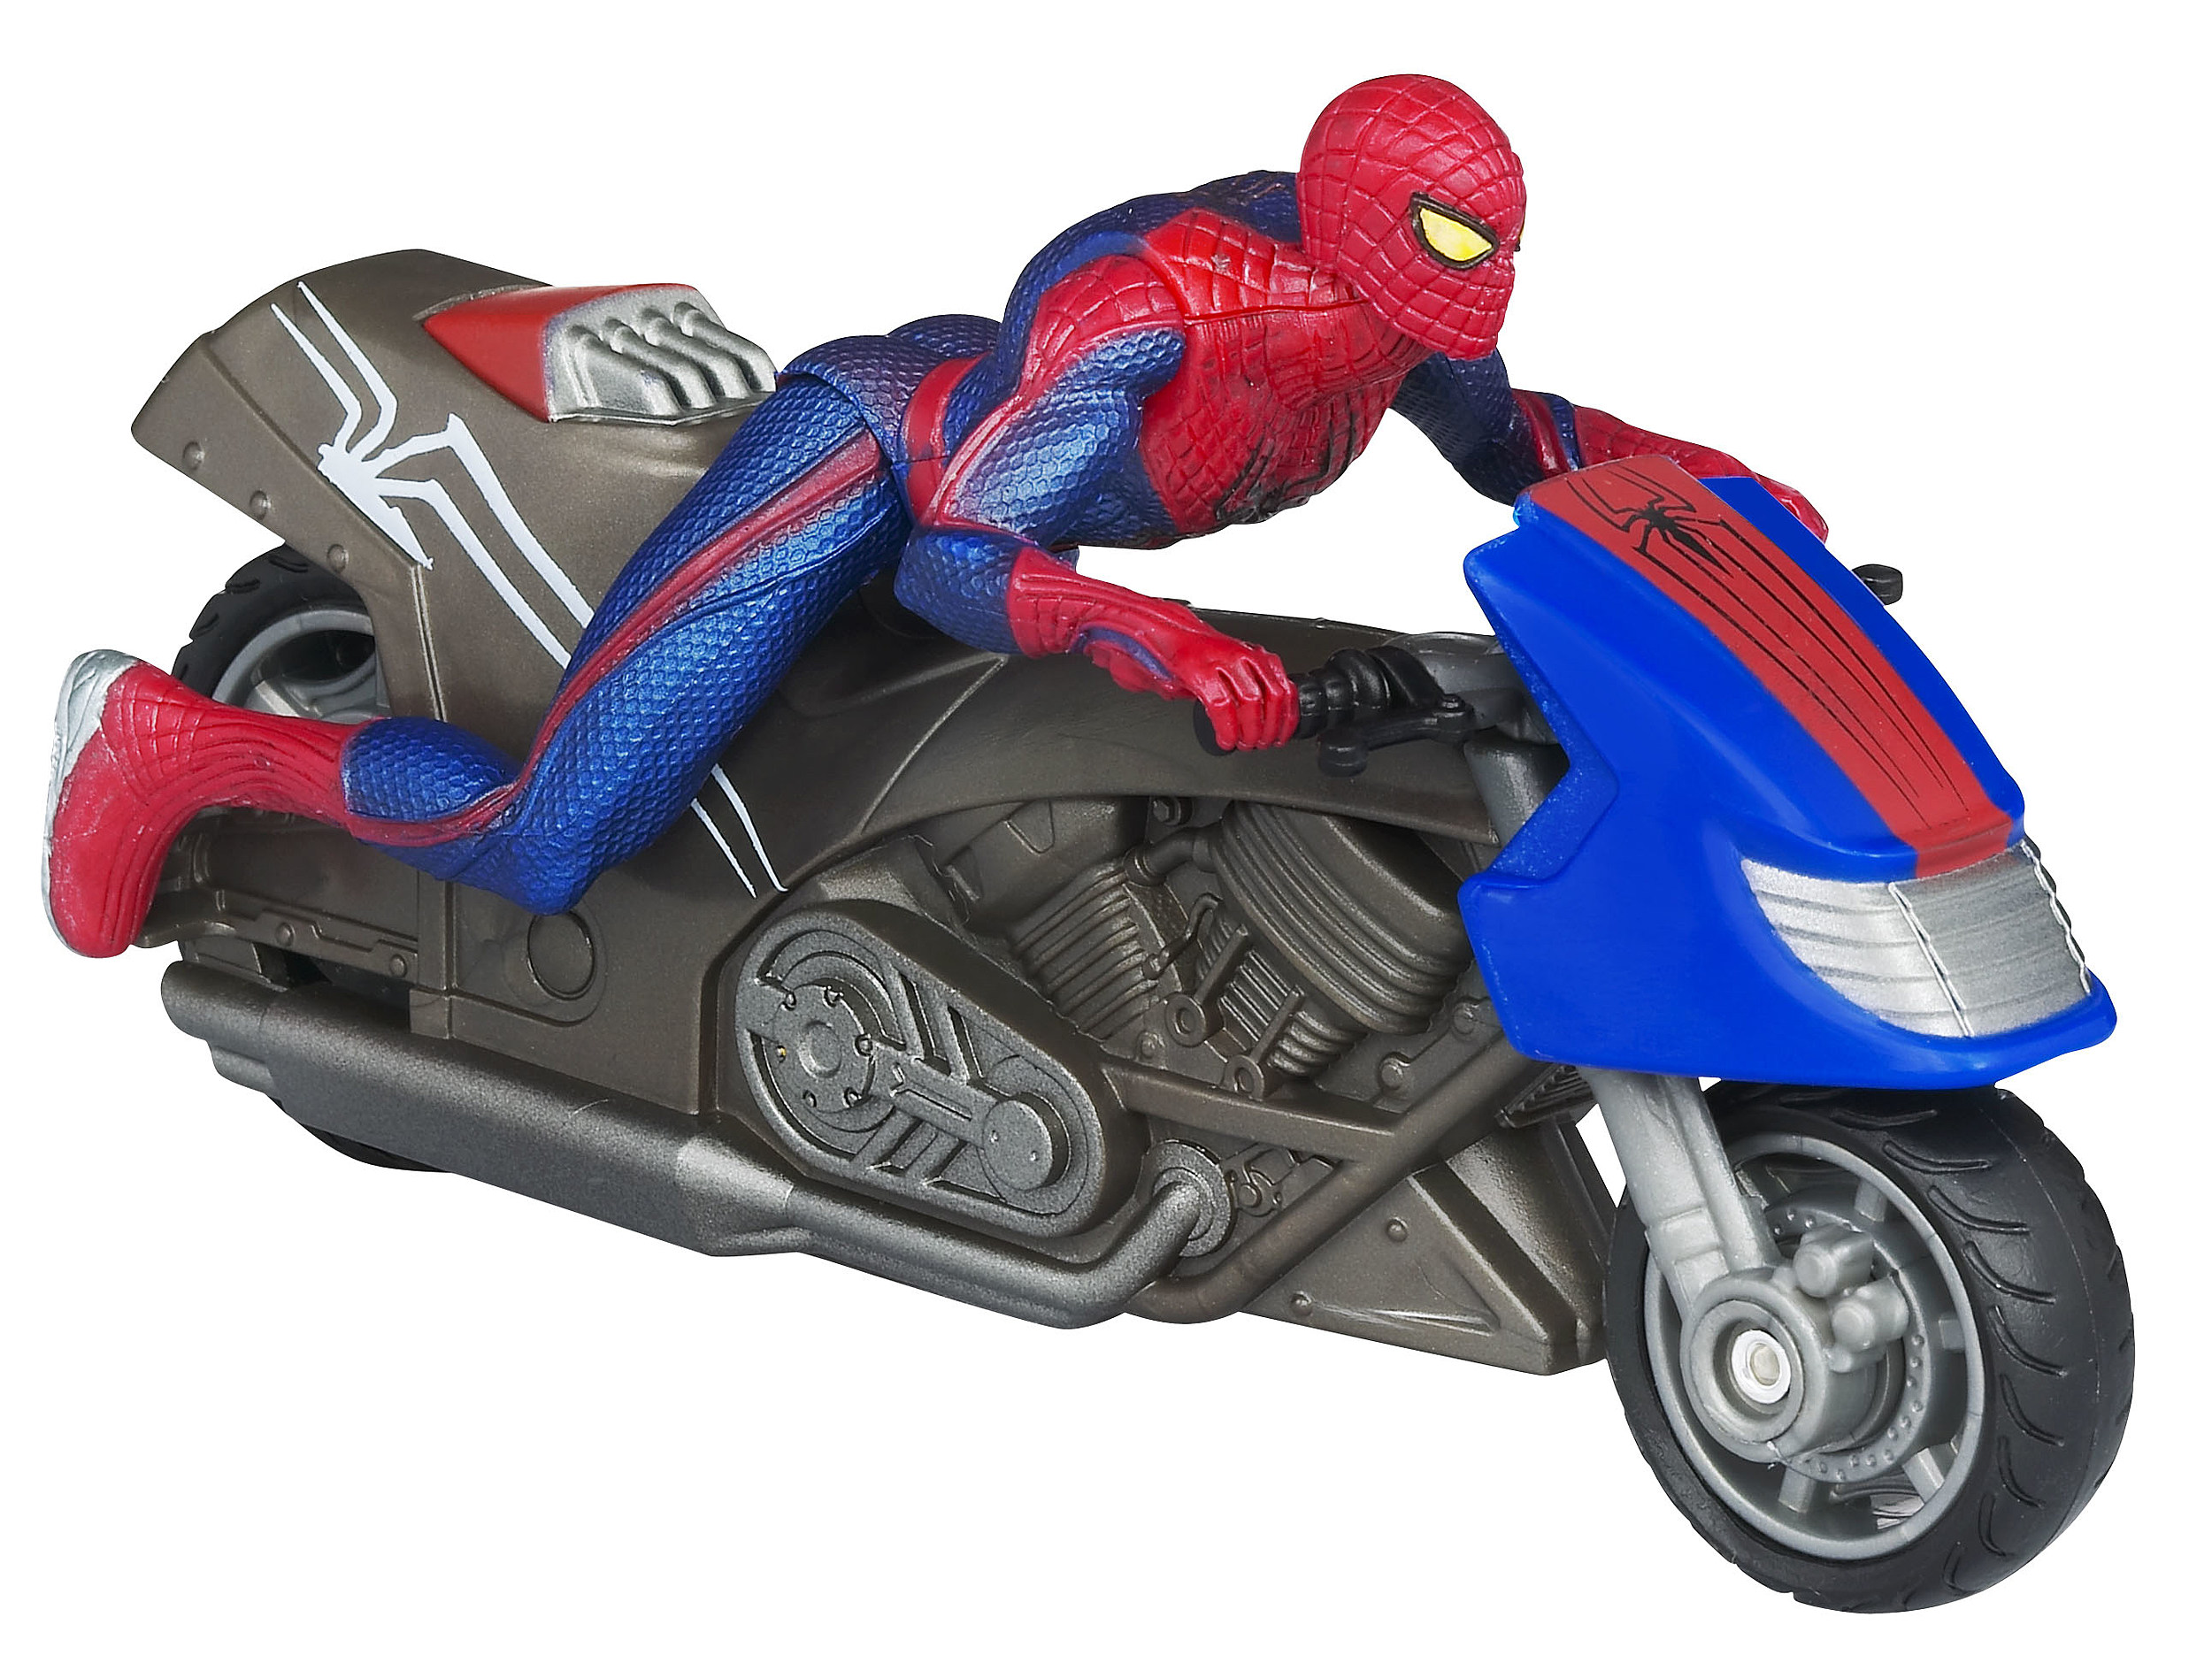 Incredible acrobatic motorbike accident - Spider man moto ...